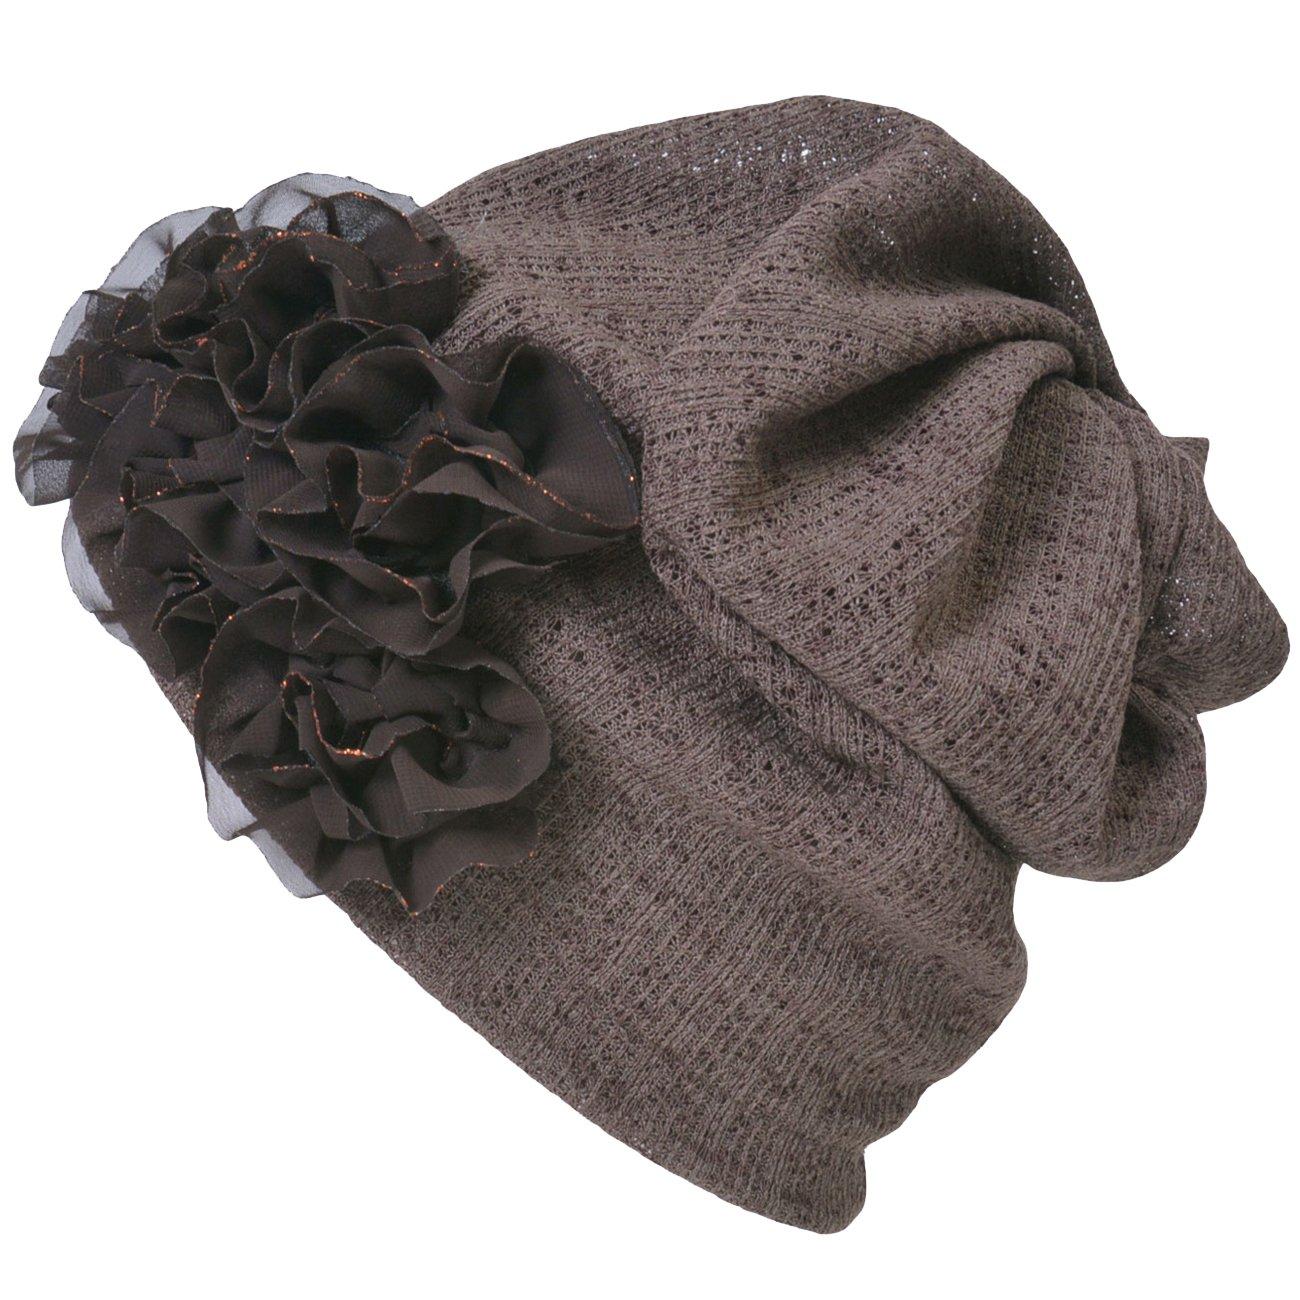 Casualbox Womens Flower Headband Neck Warmer Beanie Hat